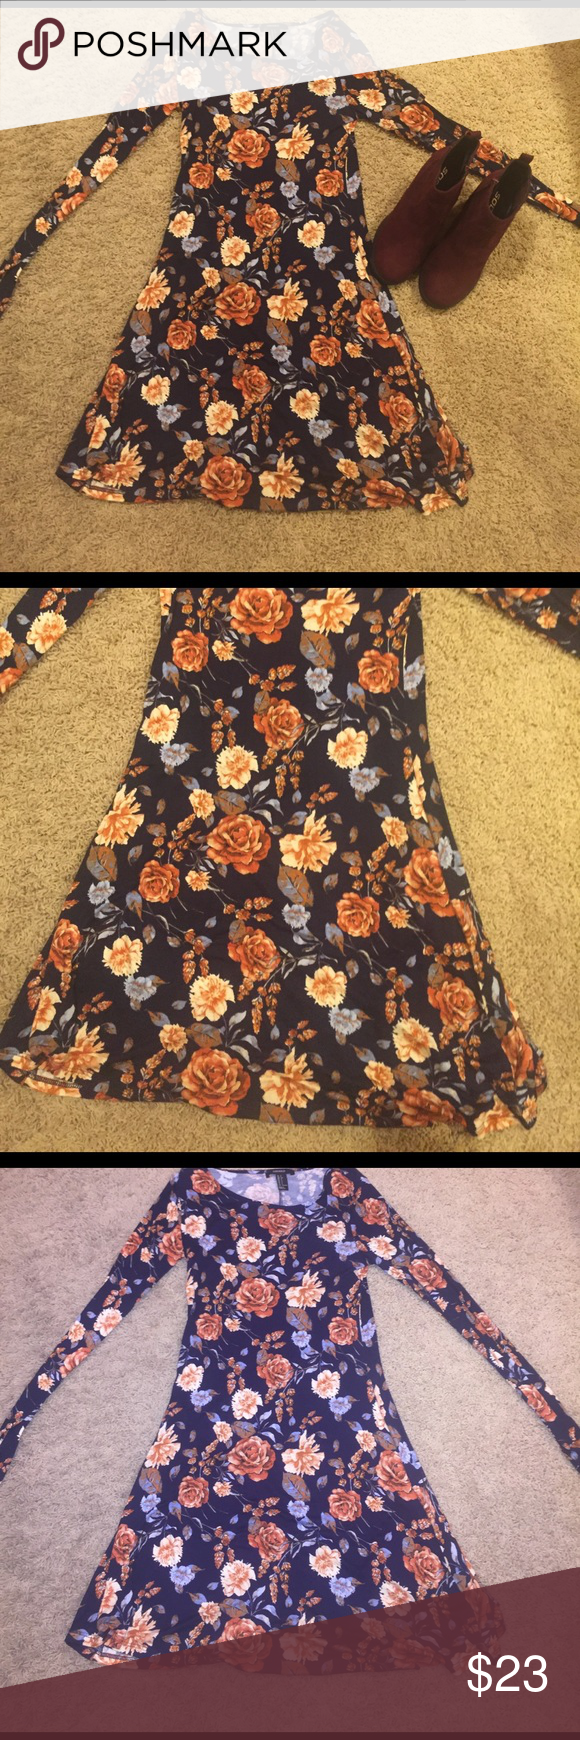 Long sleeve flower dress Never worn long sleeve flower dress Dresses